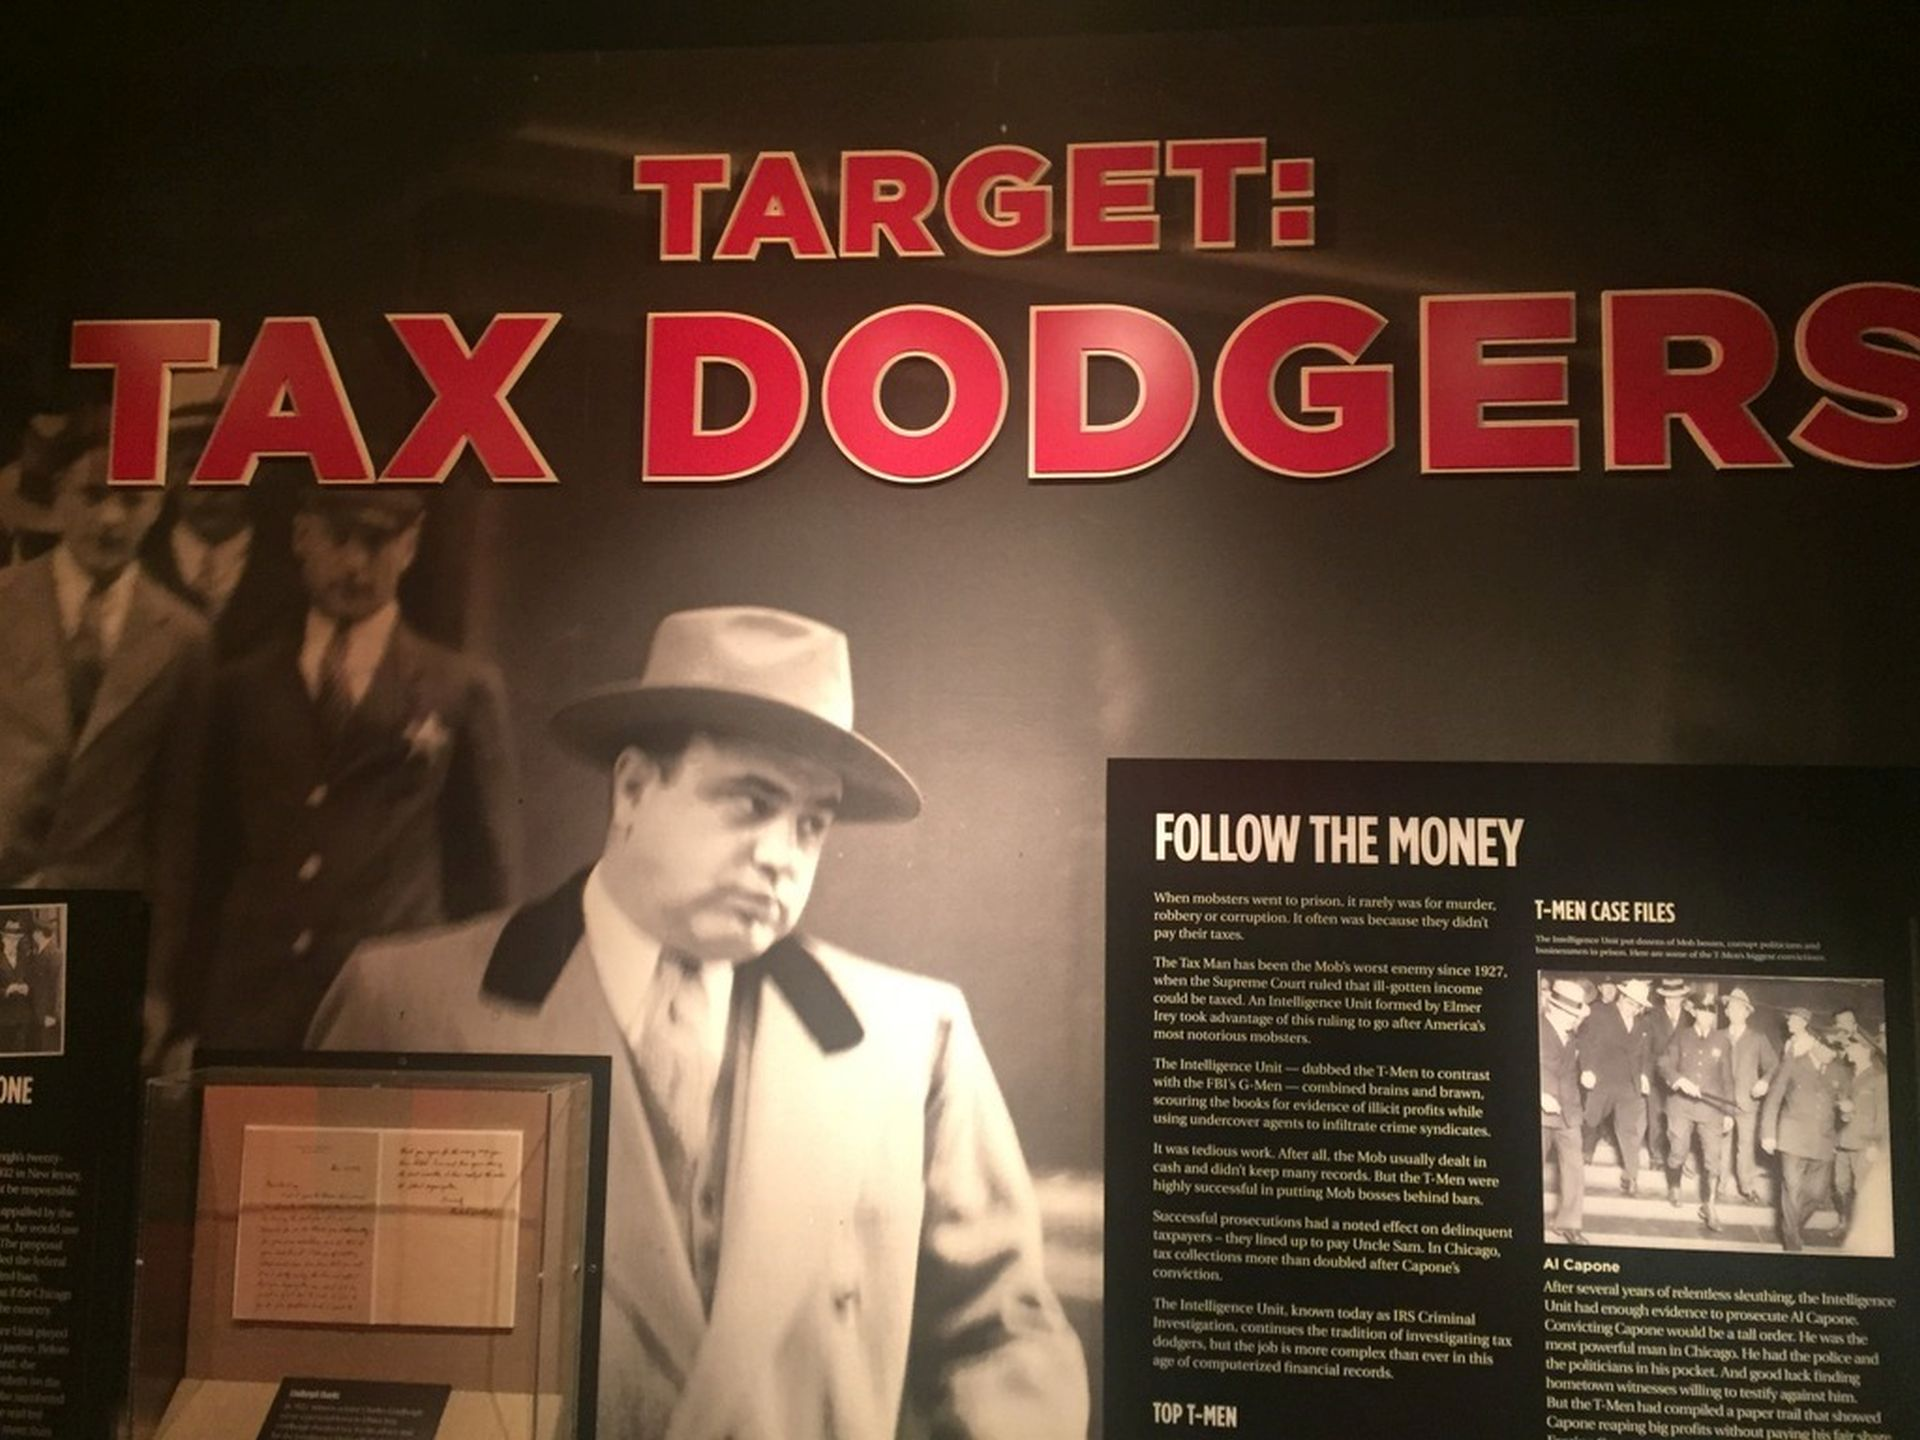 prosecute serial dodgers